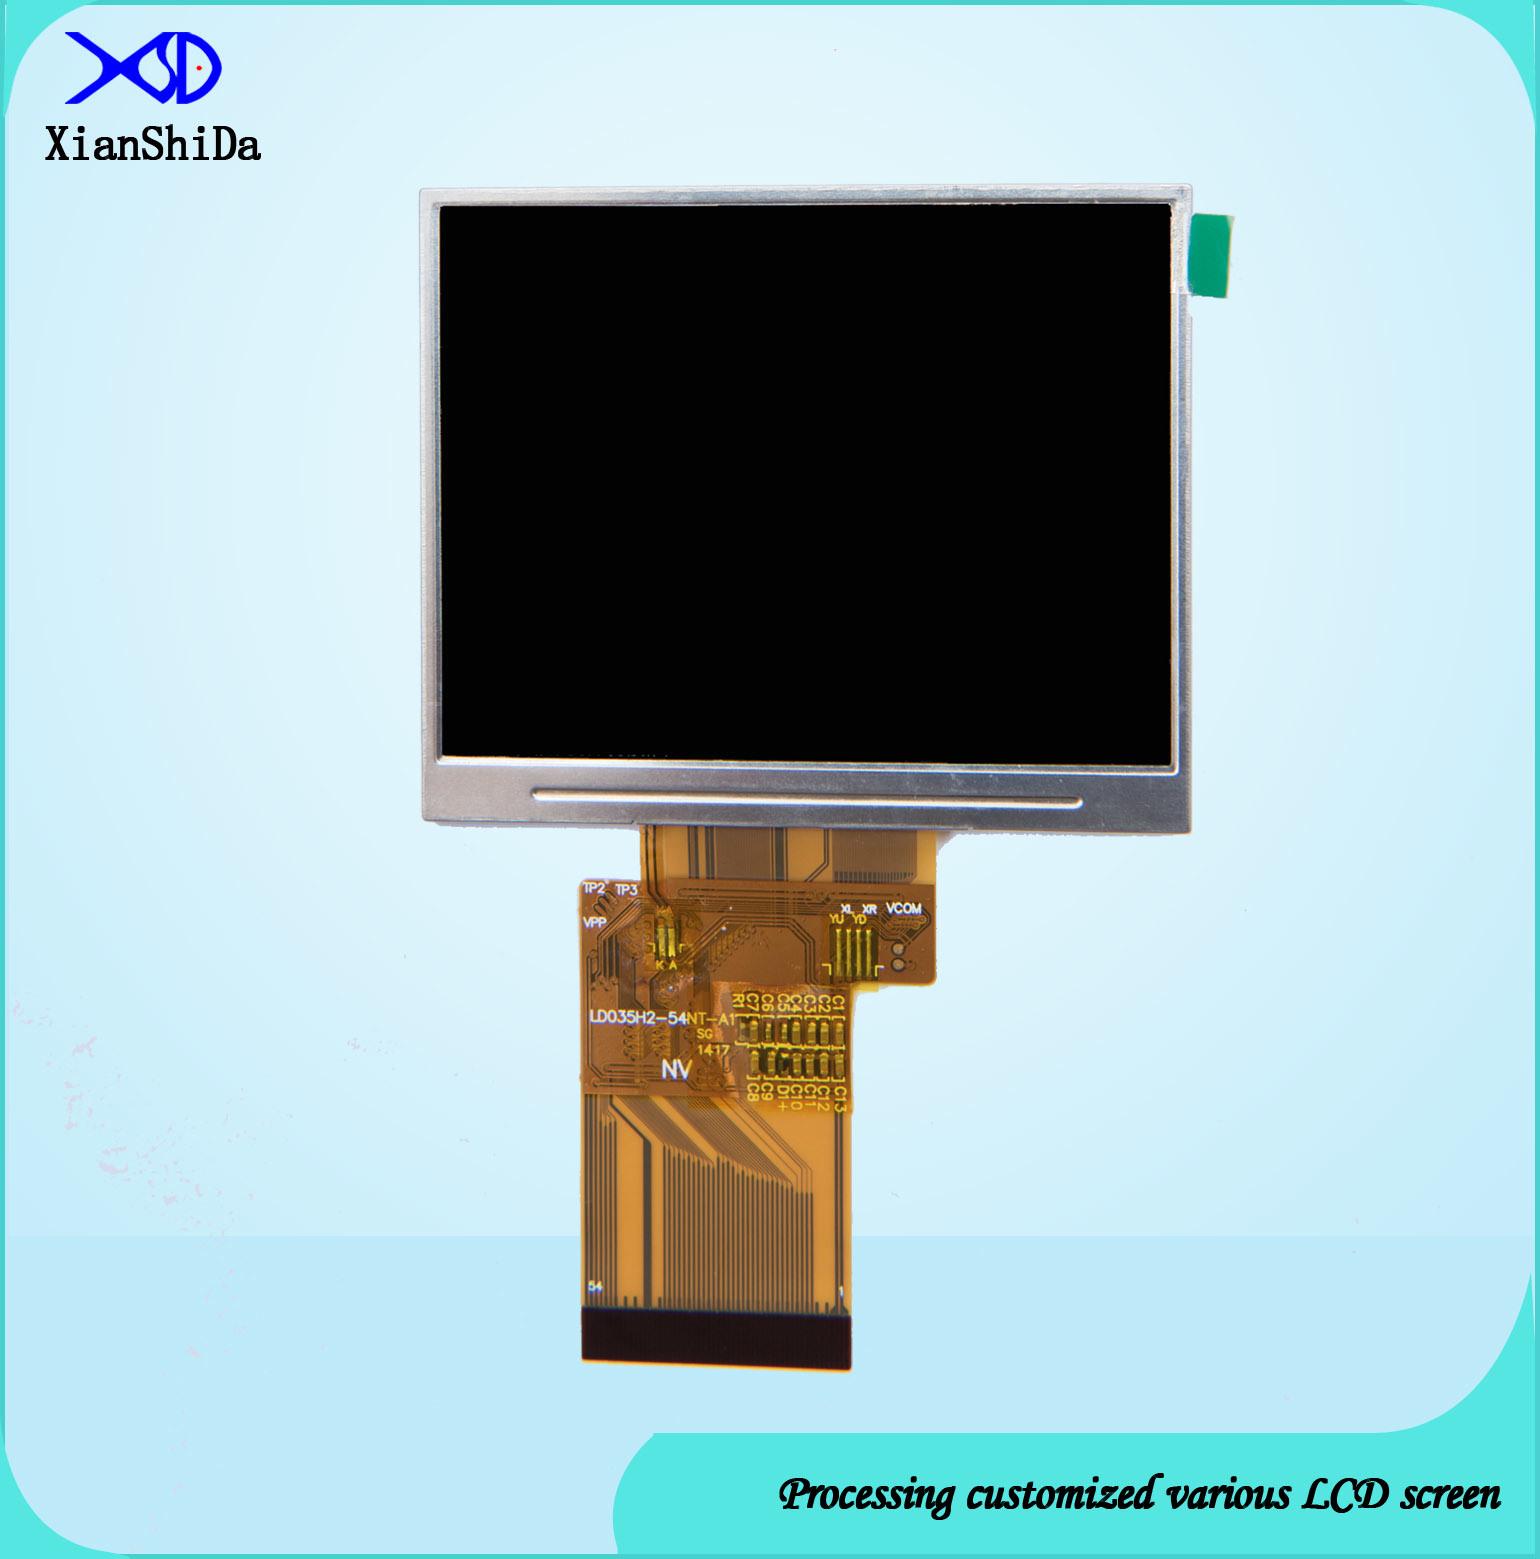 LCD Display 700CD/M2 High Brightness 3.5 Inch TFT Module